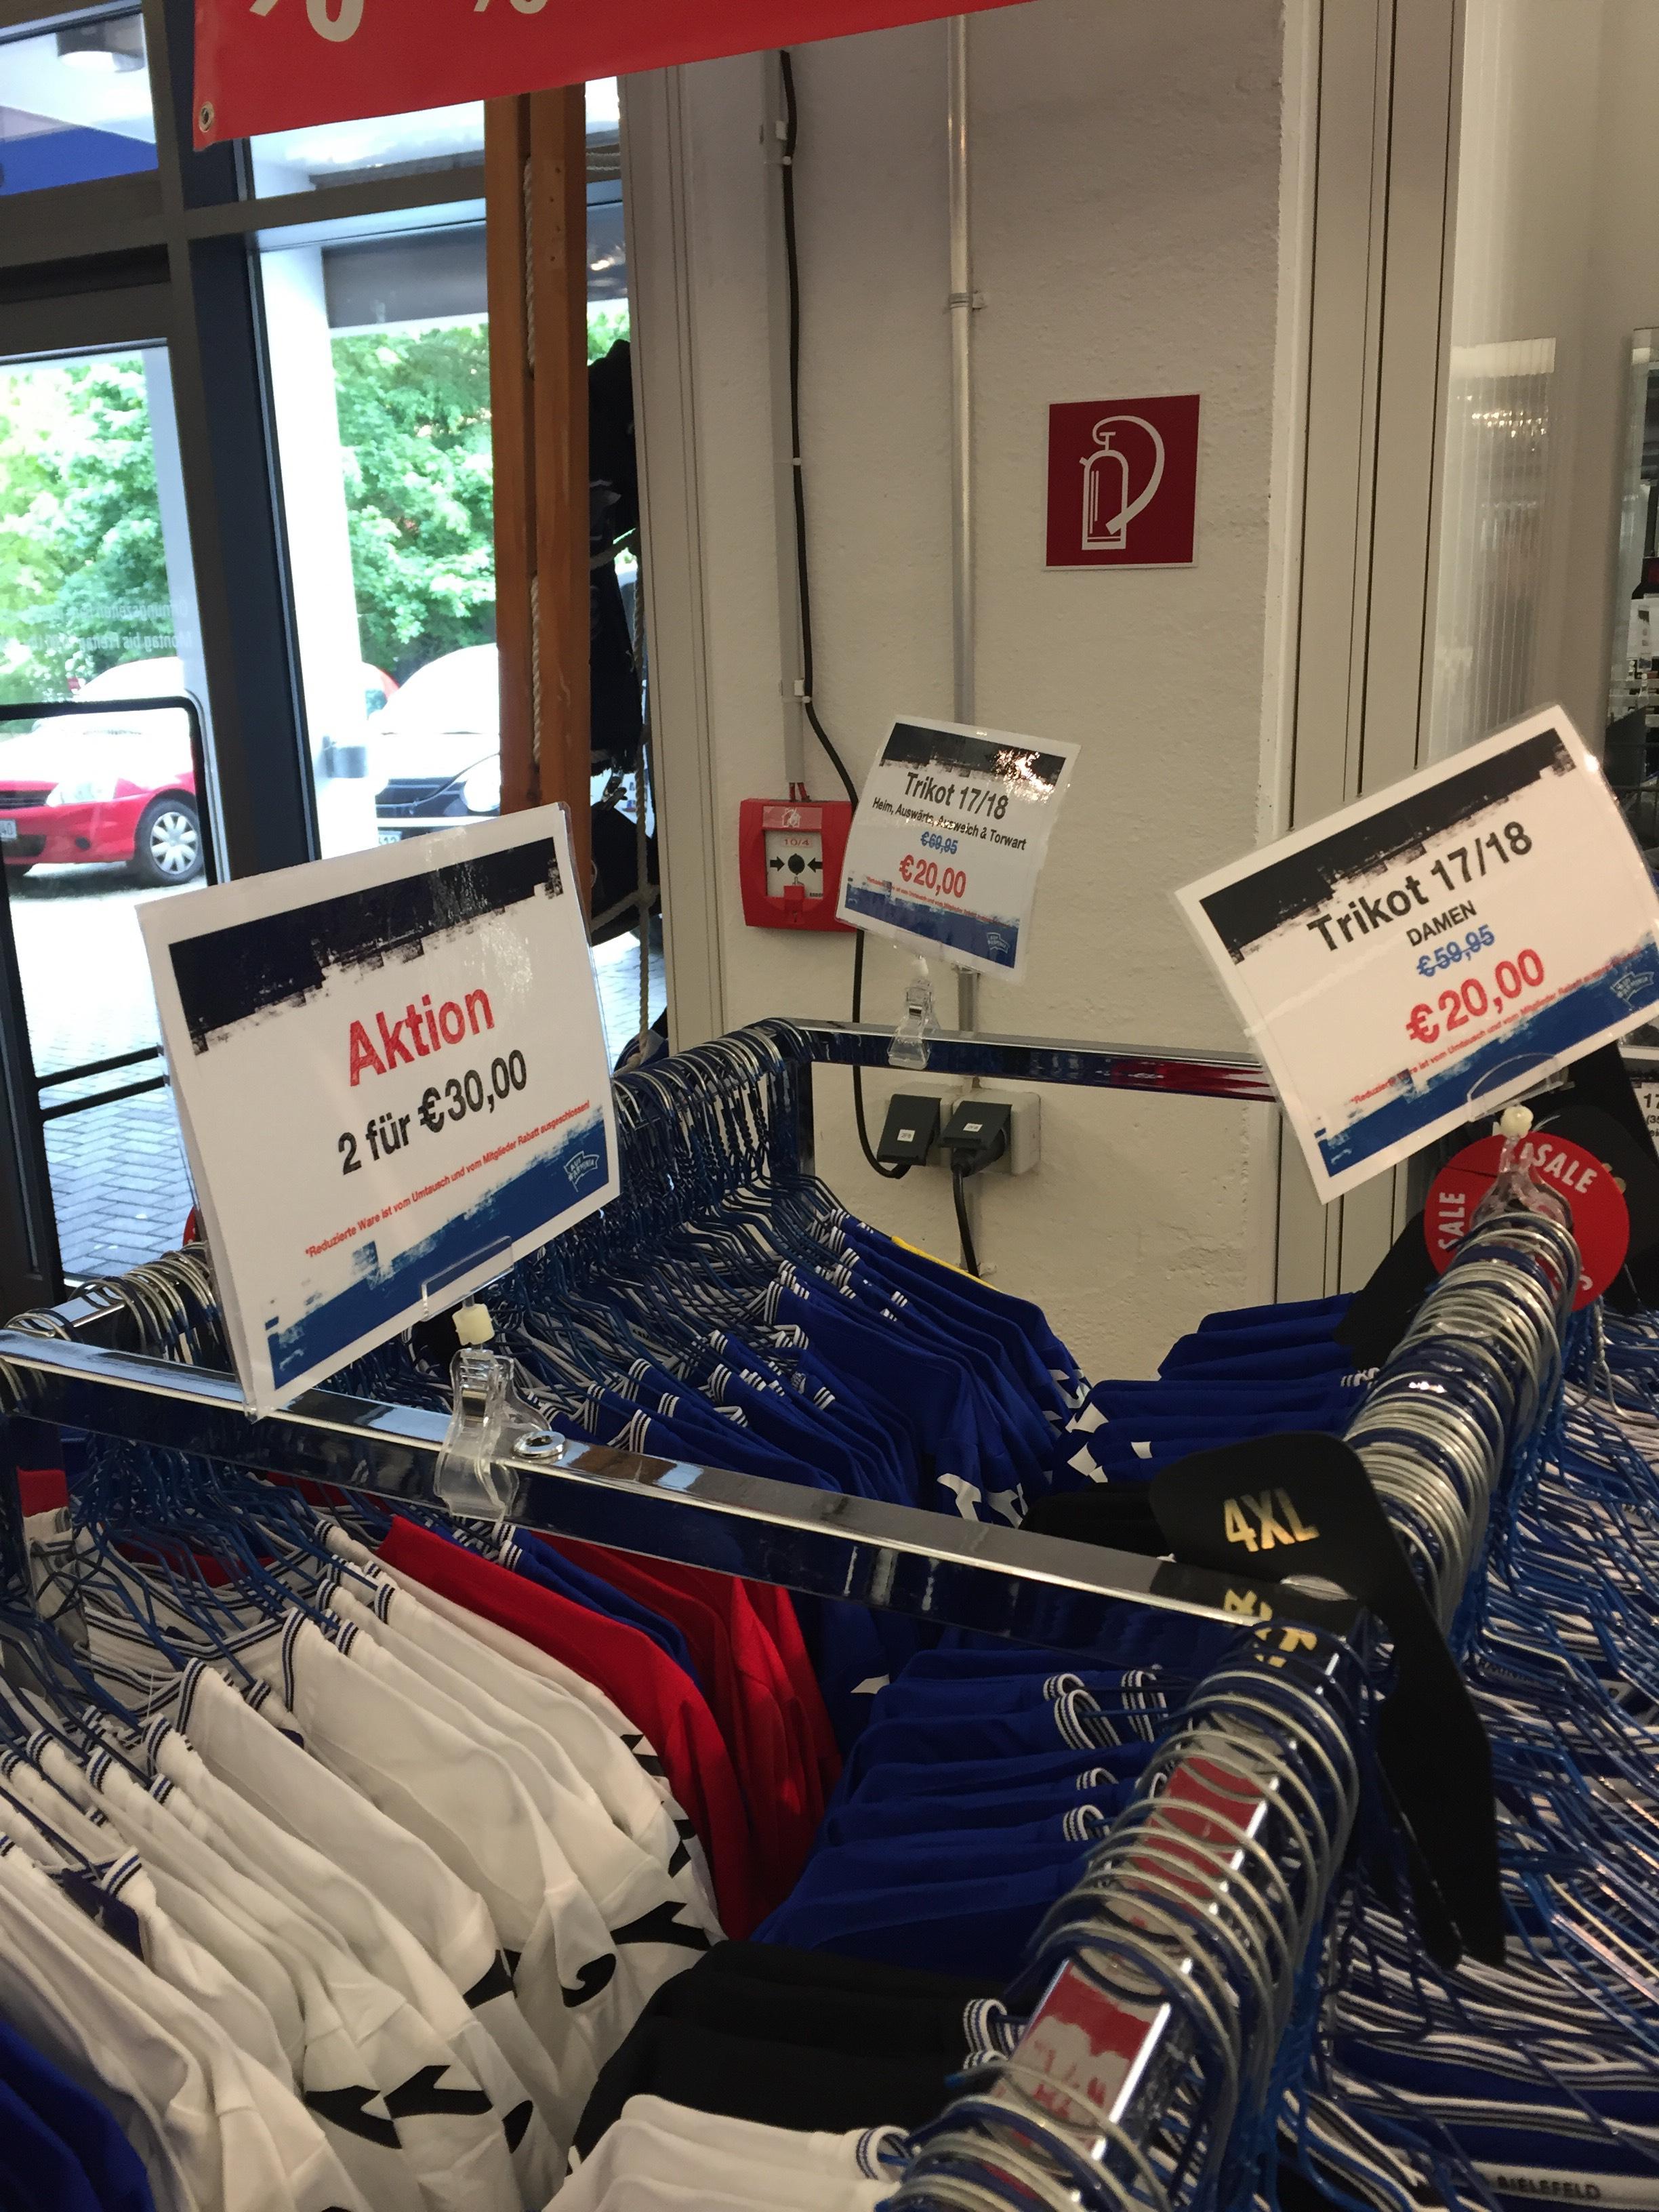 Arminia Bielefeld Trikots 17/18 // Lokal 2 Trikots für 30 Euro, online Trikot 20 € + Versand